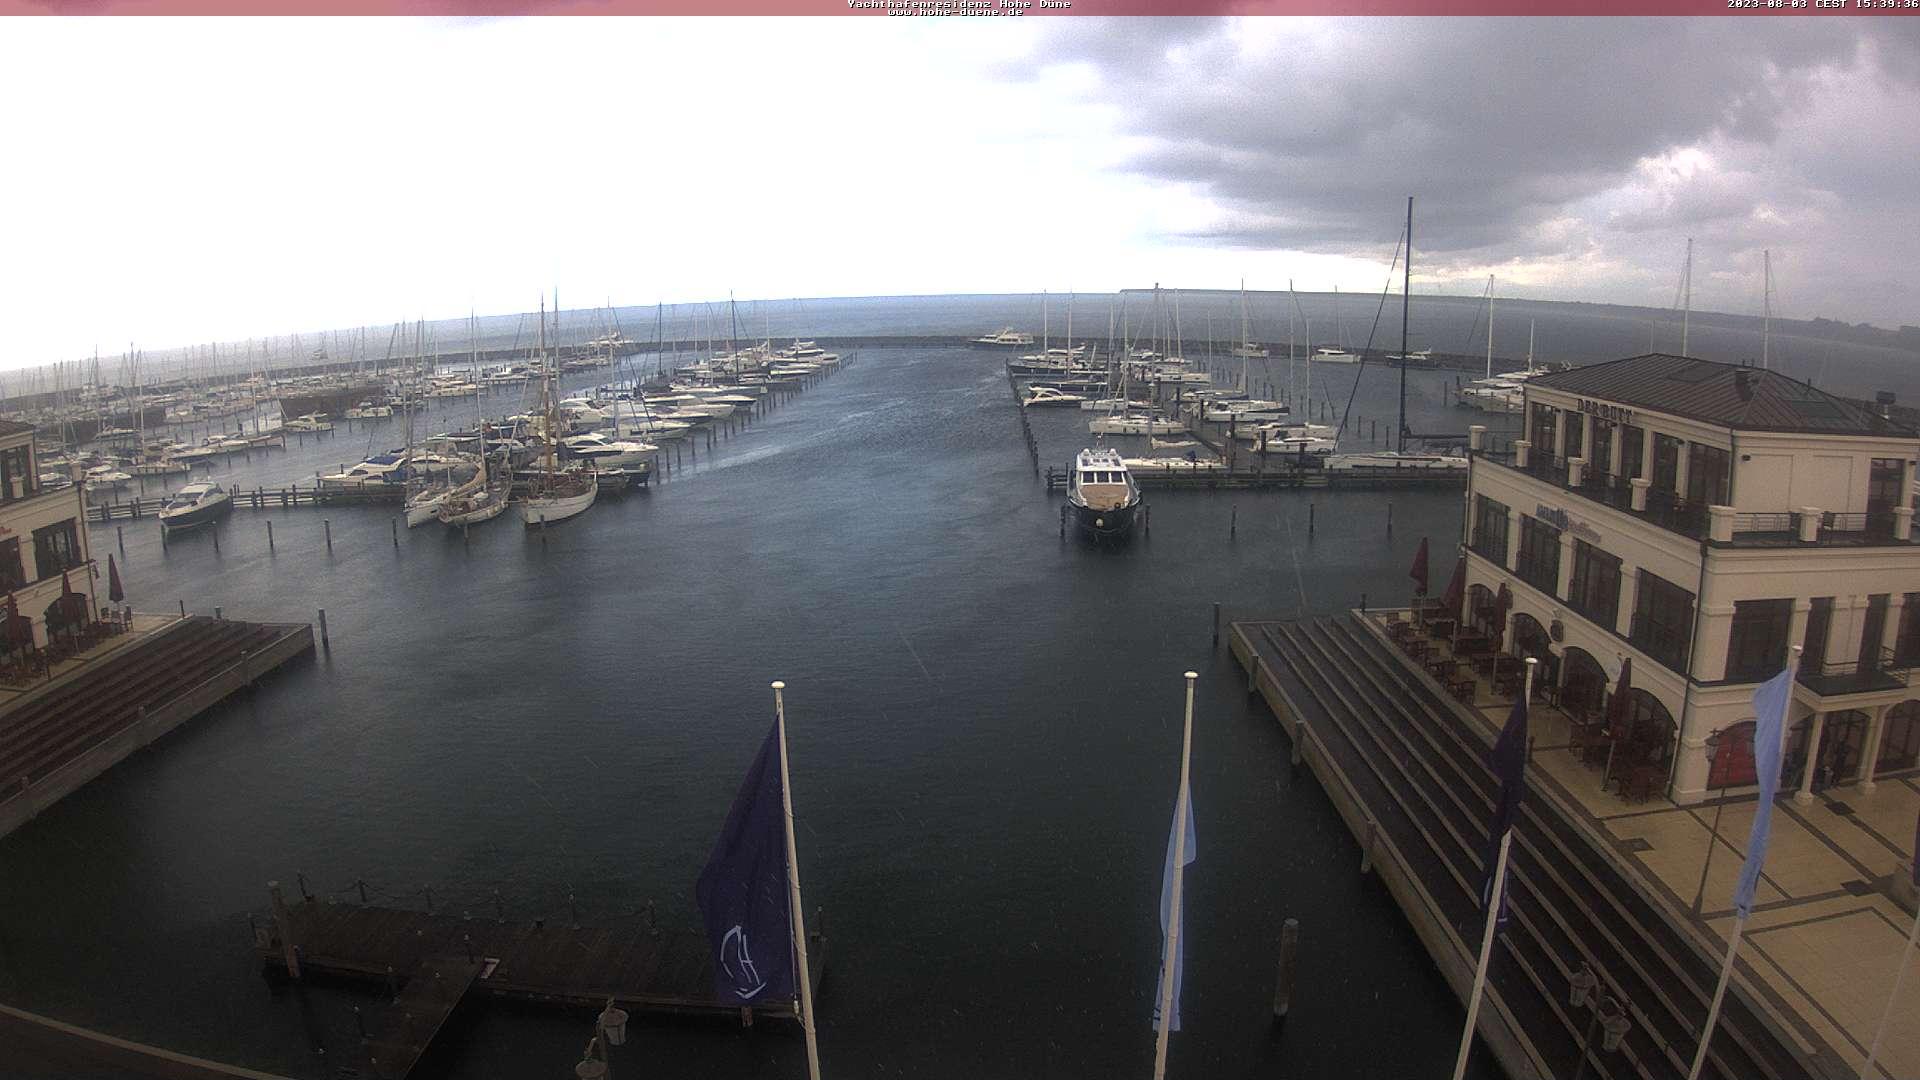 Rostock-Hohe Düne Pier Northeast